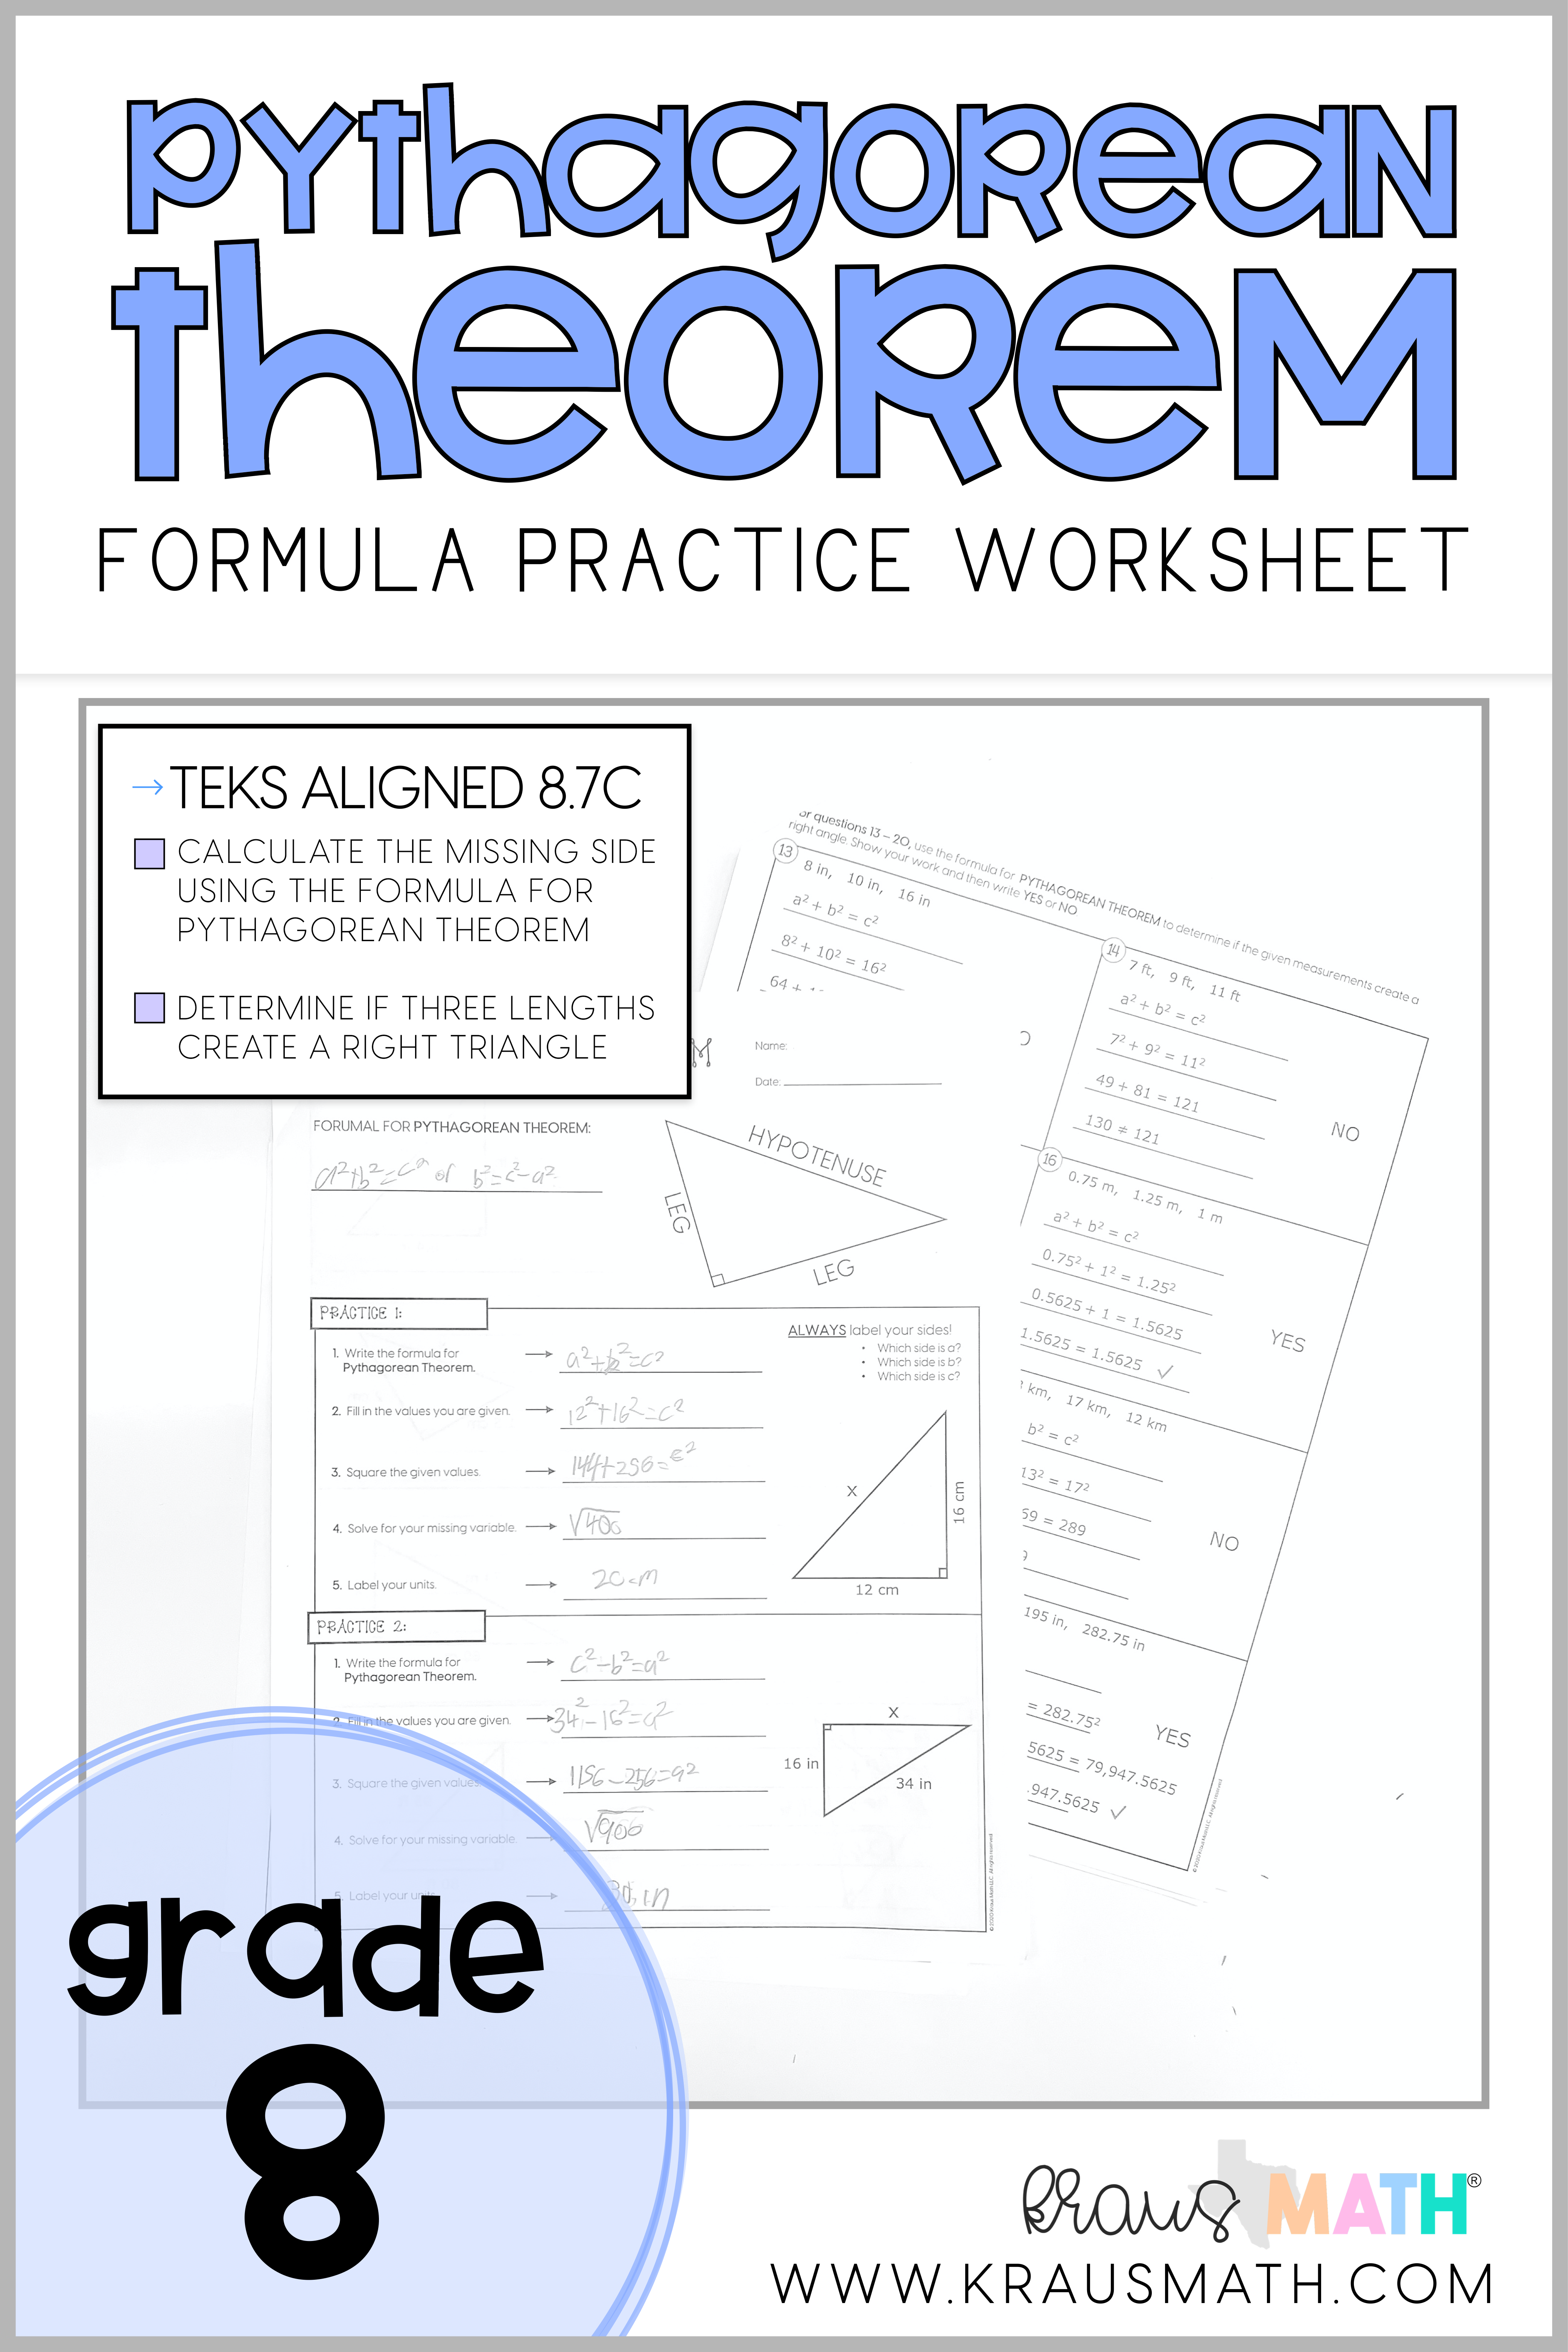 Pythagorean Theorem Guided Practice Worksheet   TEKS 8.7C   Kraus Math    High school math lessons [ 6250 x 4167 Pixel ]